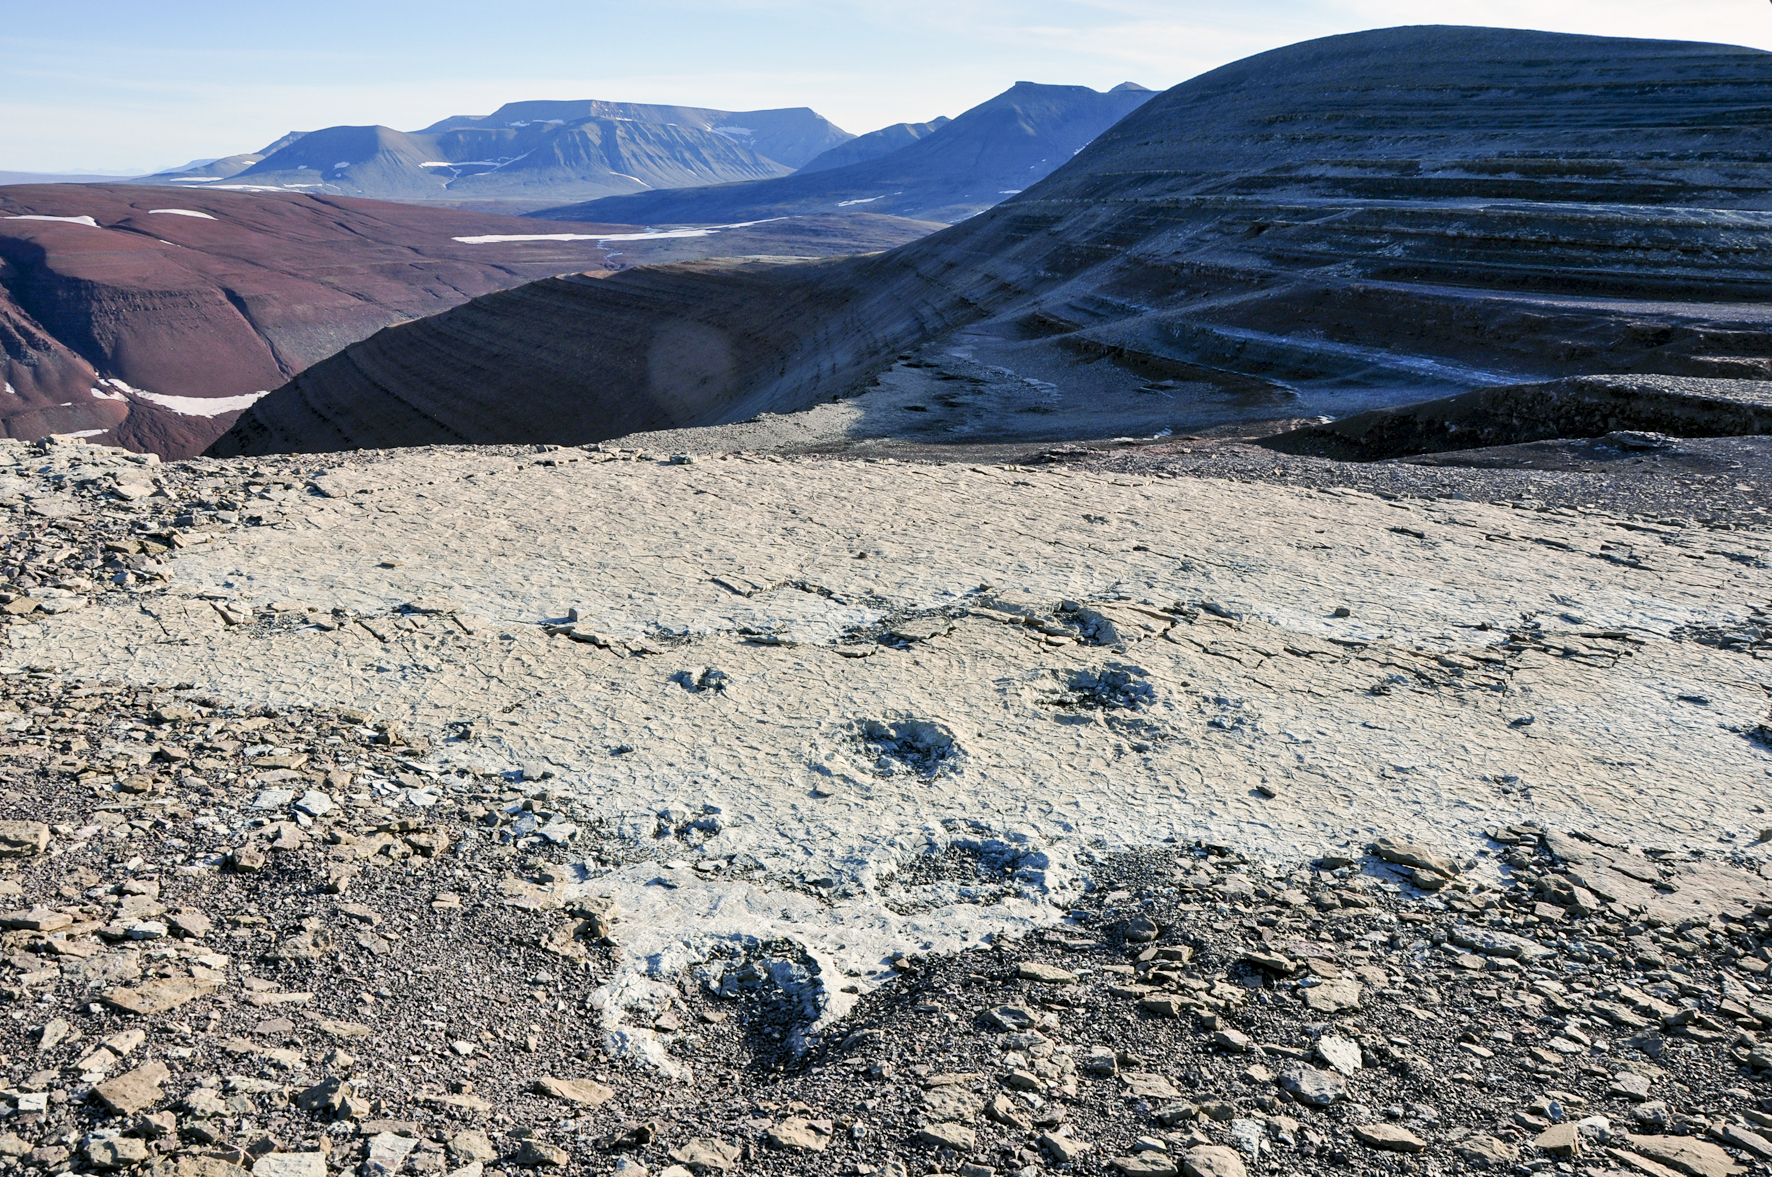 210 million year old dinosaur trackway. Photo: Benjamin Kear